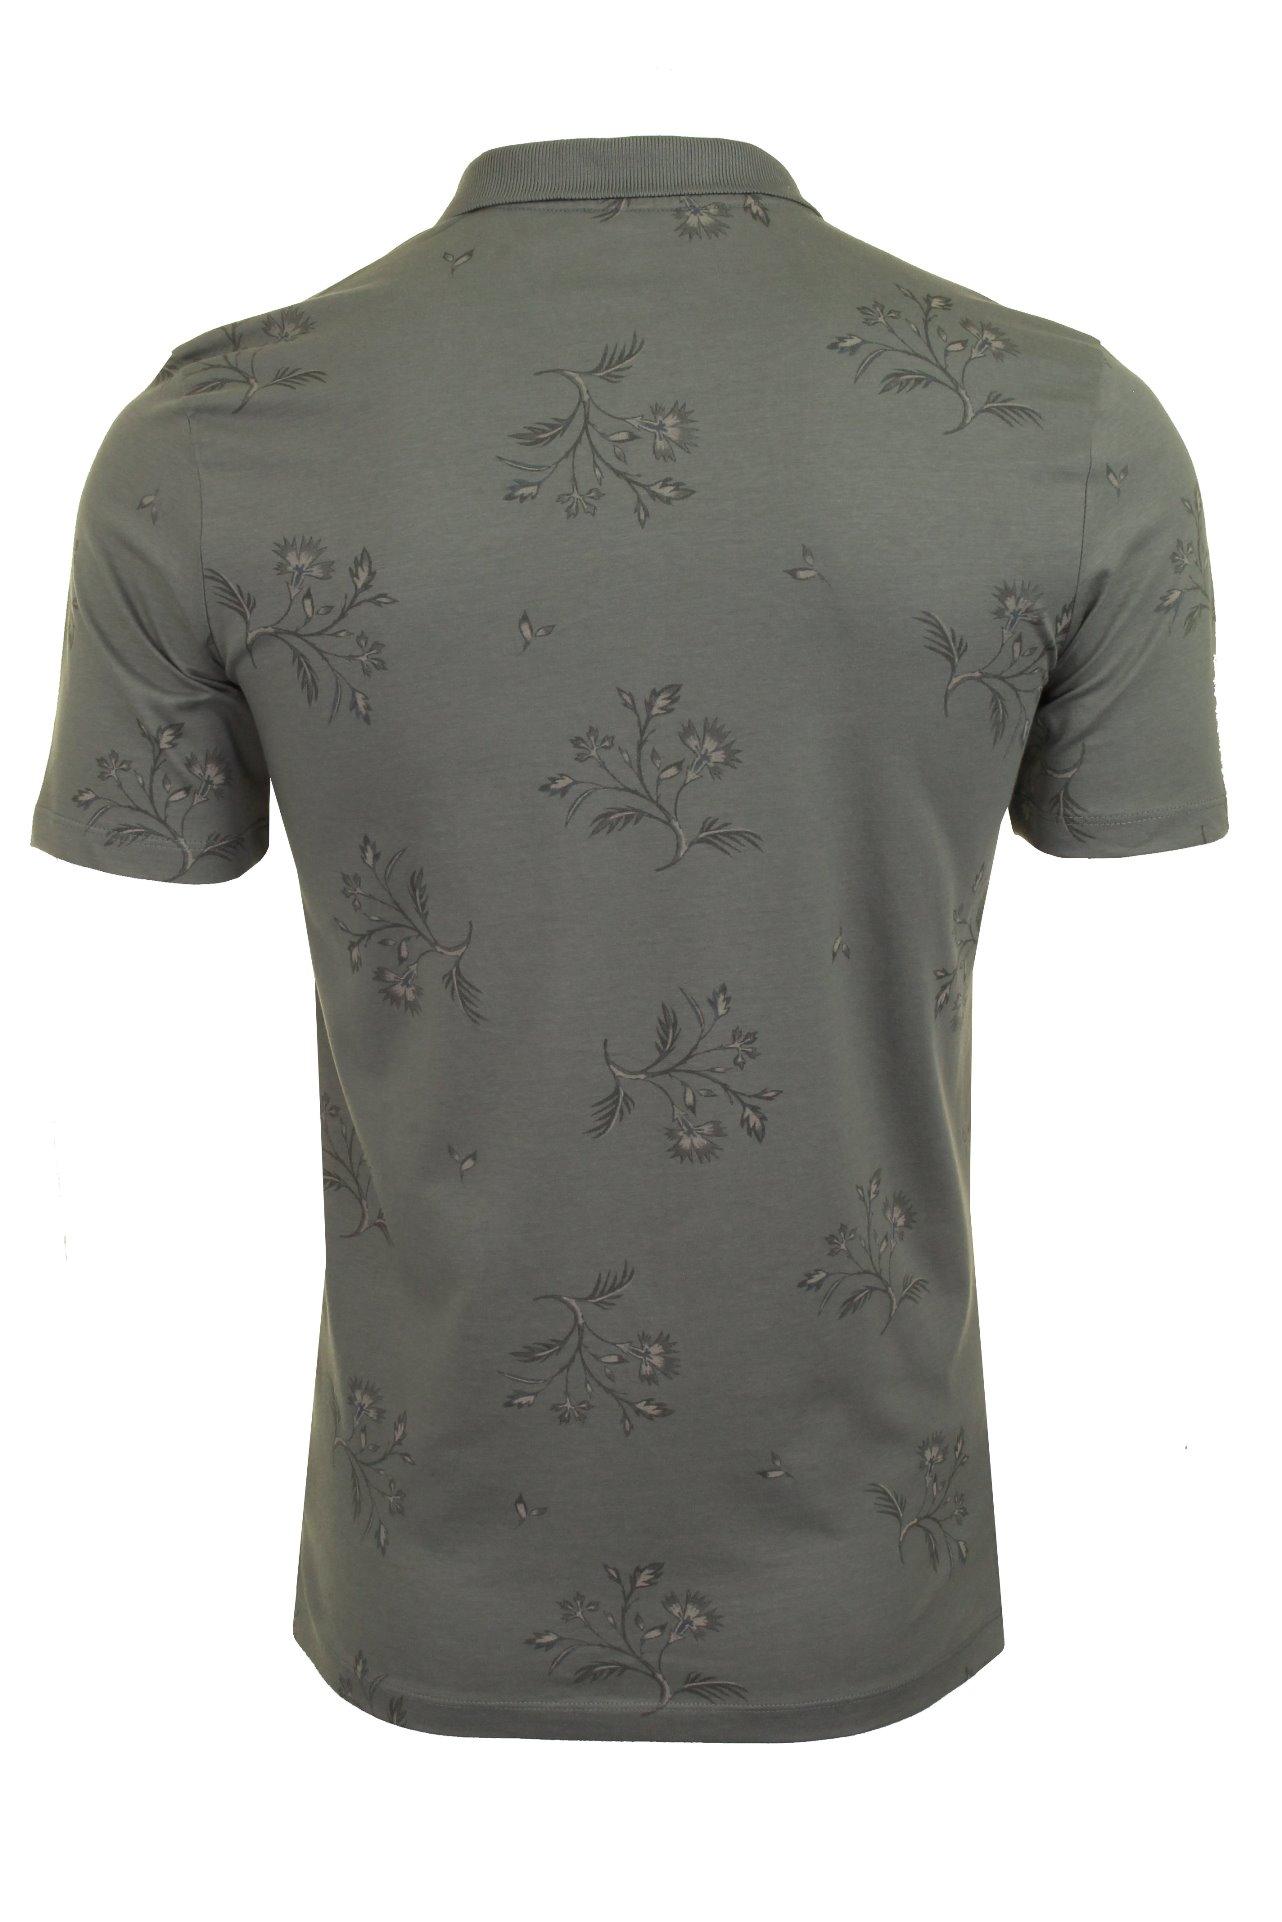 Jack-amp-Jones-Mens-Shirt-039-JPRJAMES-039-Short-Sleeved thumbnail 8